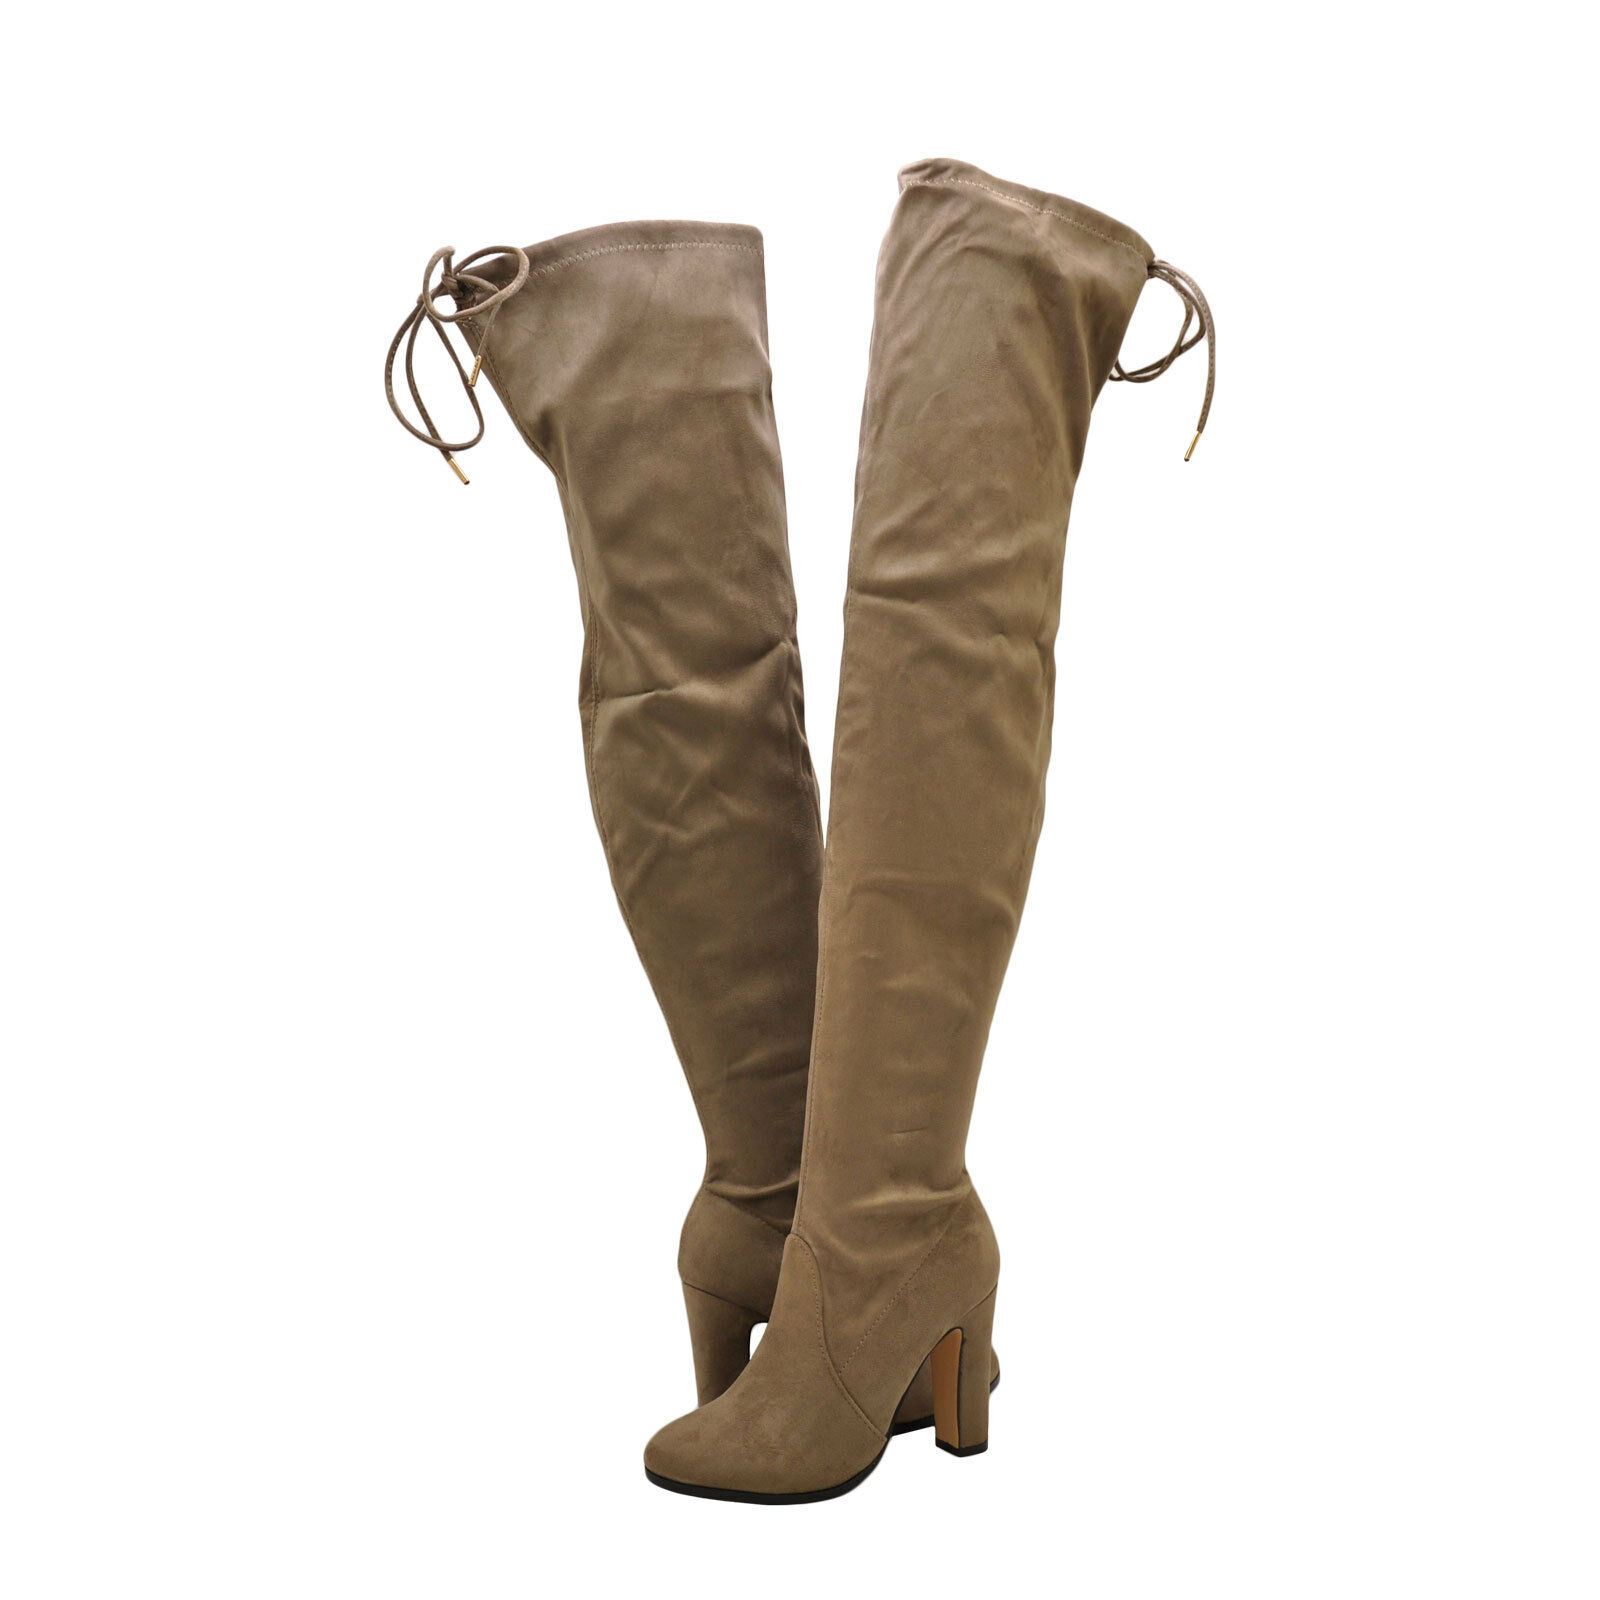 Womens shoes Cape Robbin Mona 1 Faux Suede Thigh High Boot Khaki New